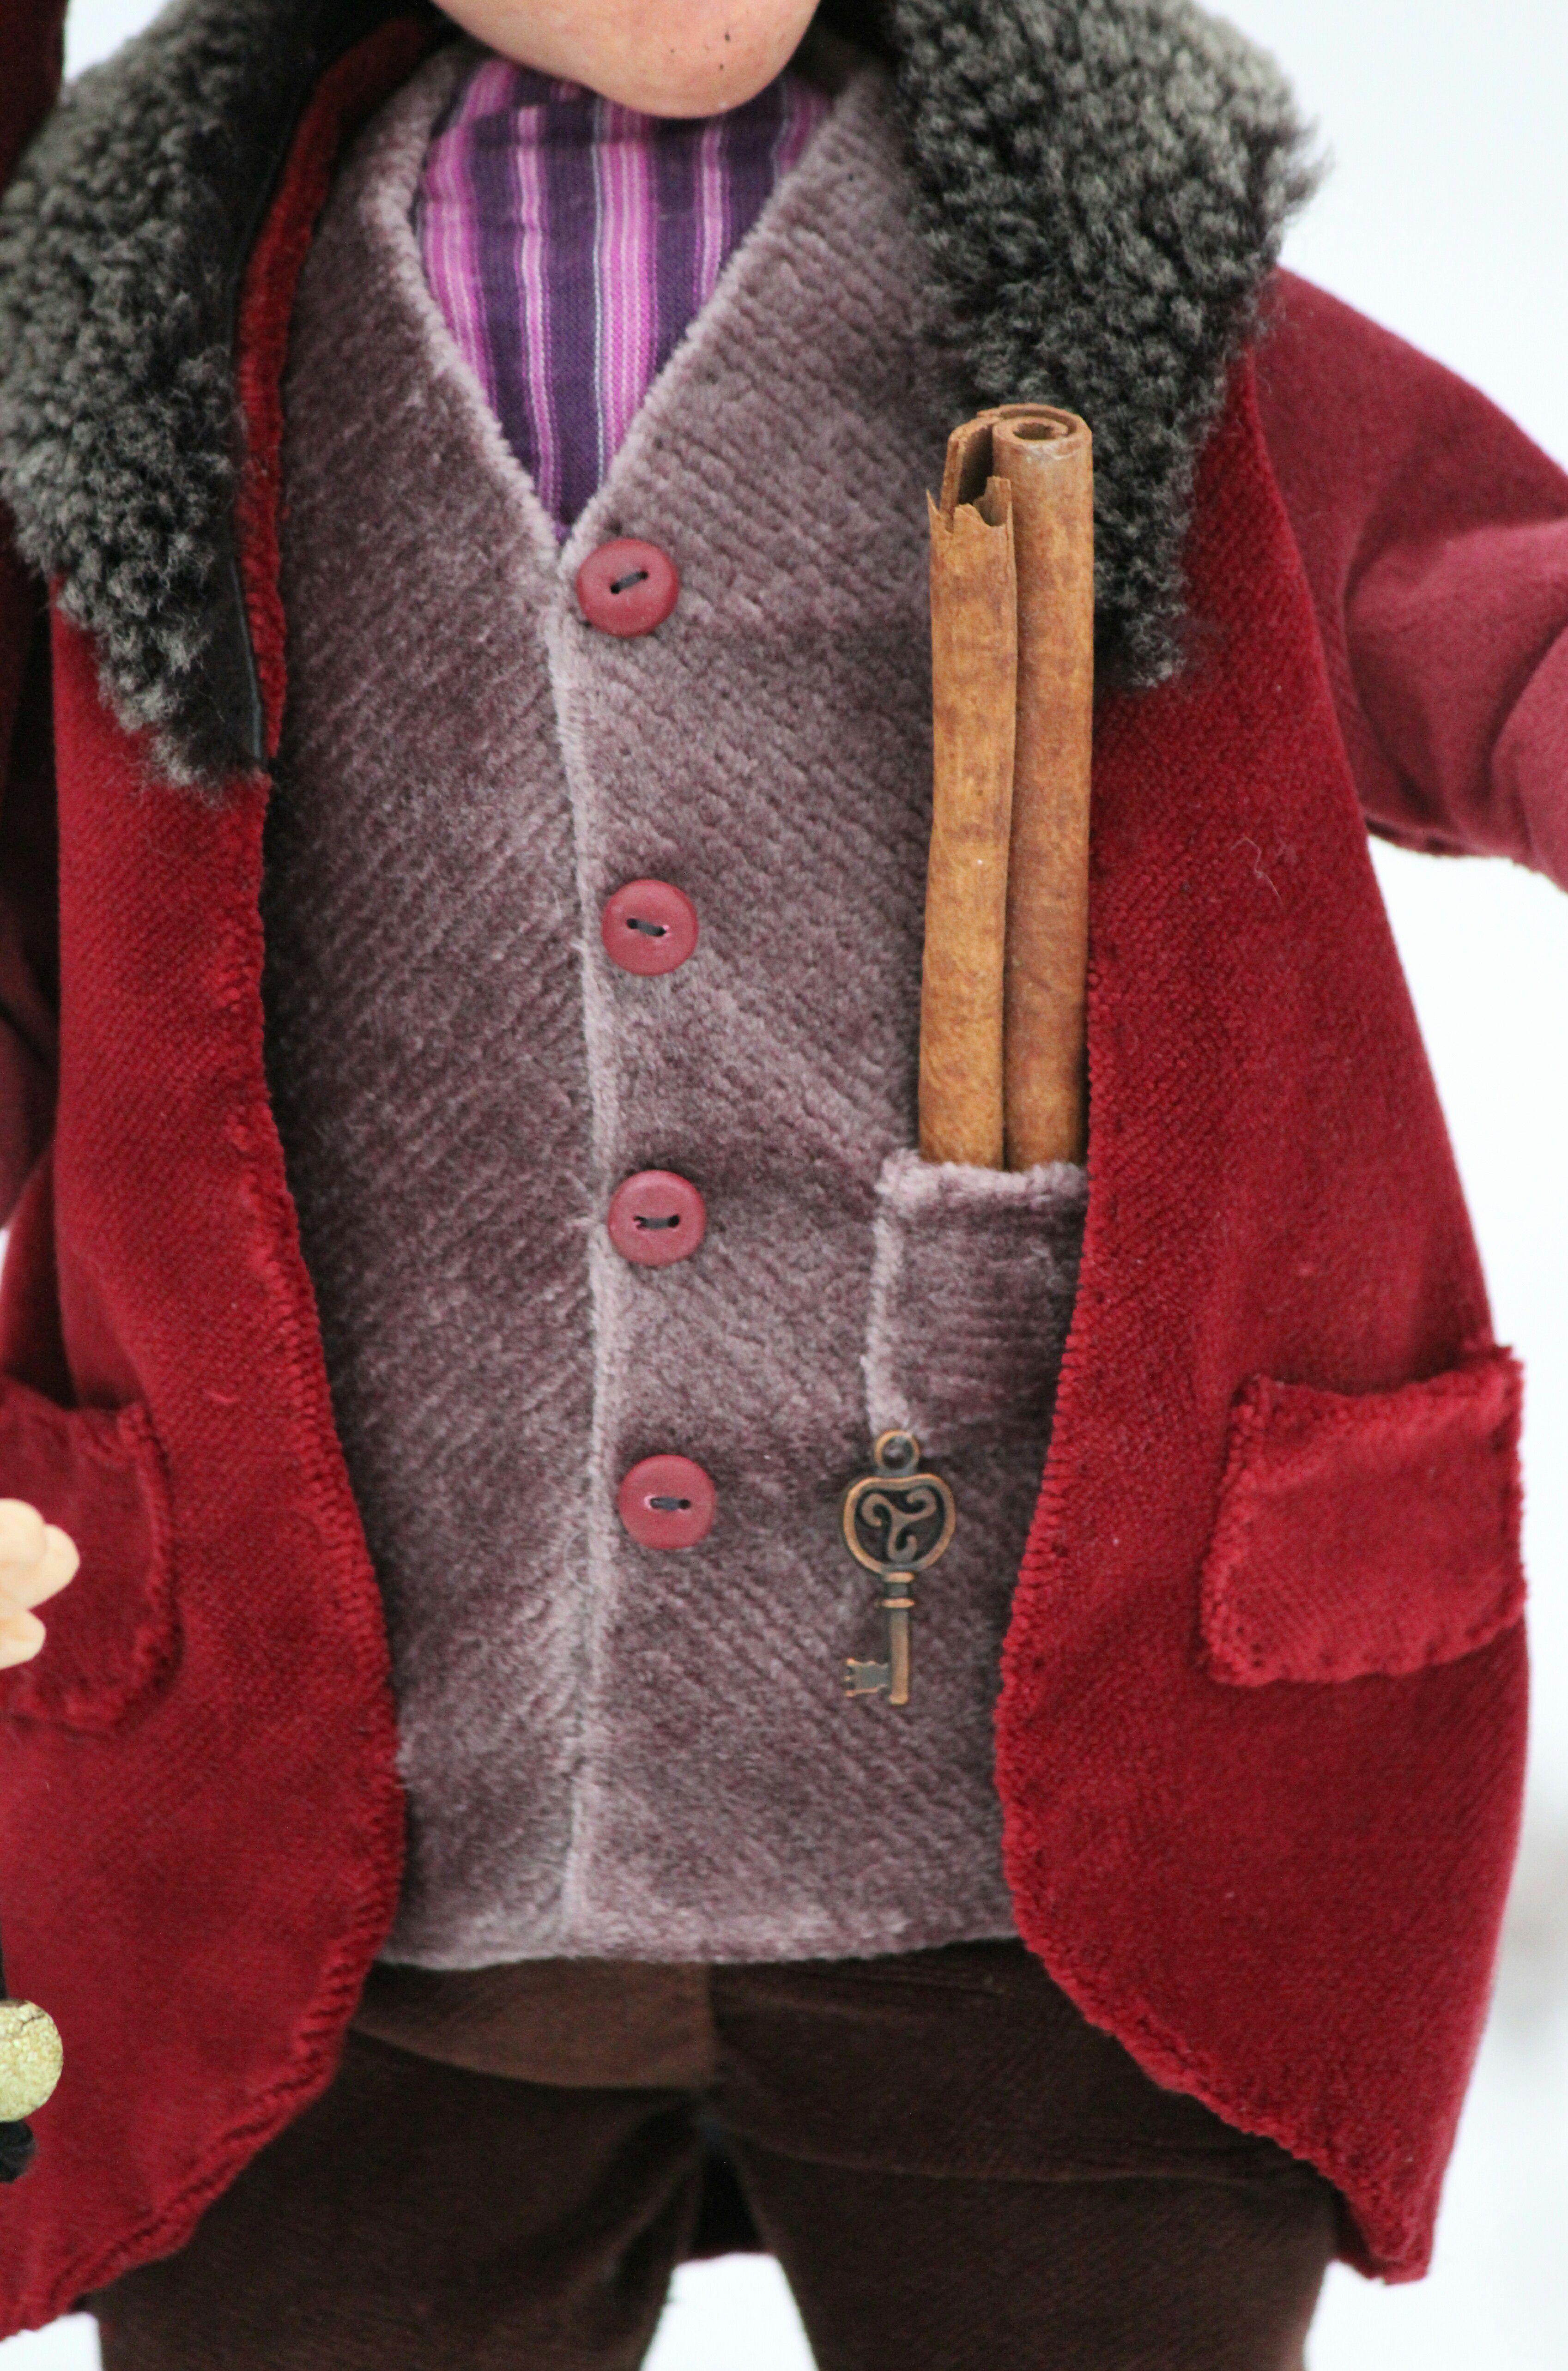 сказка авторскаякукла сувенир куклаолелукойе олелукойе кукласказочник кукладедушка кукла куклавподарок